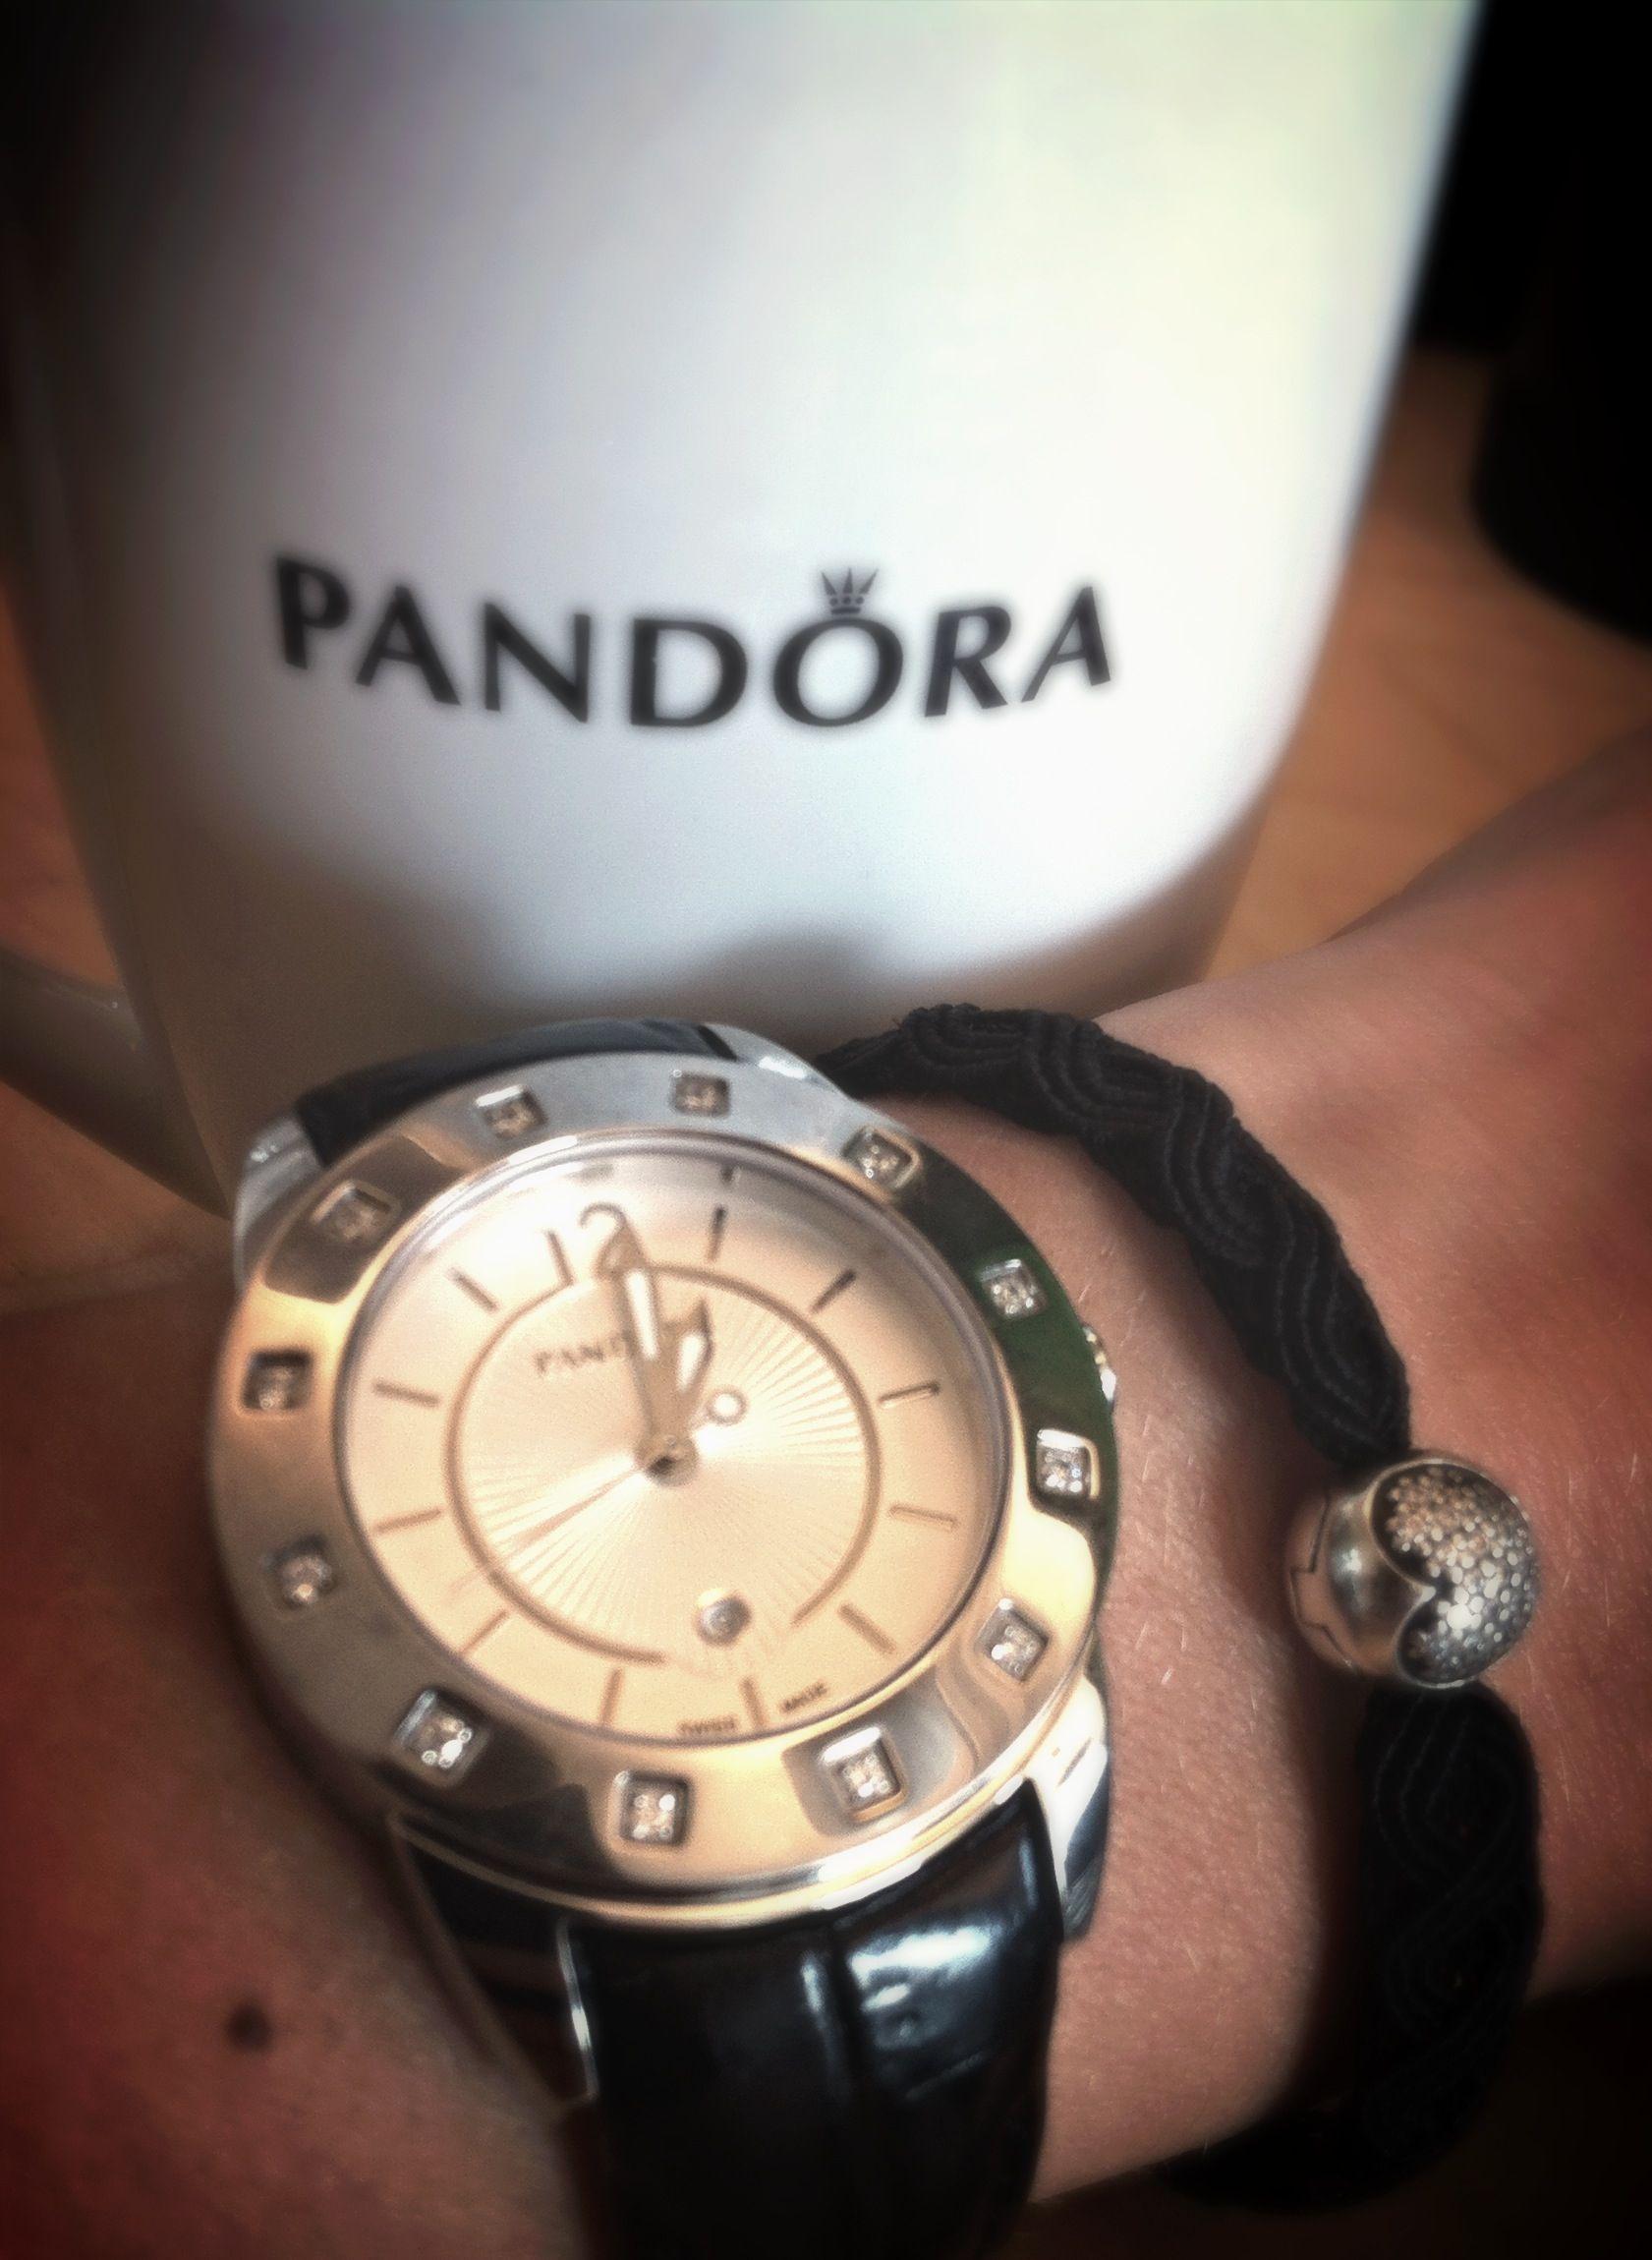 Pandora Watches Imagine With Diamond Bezel And Black